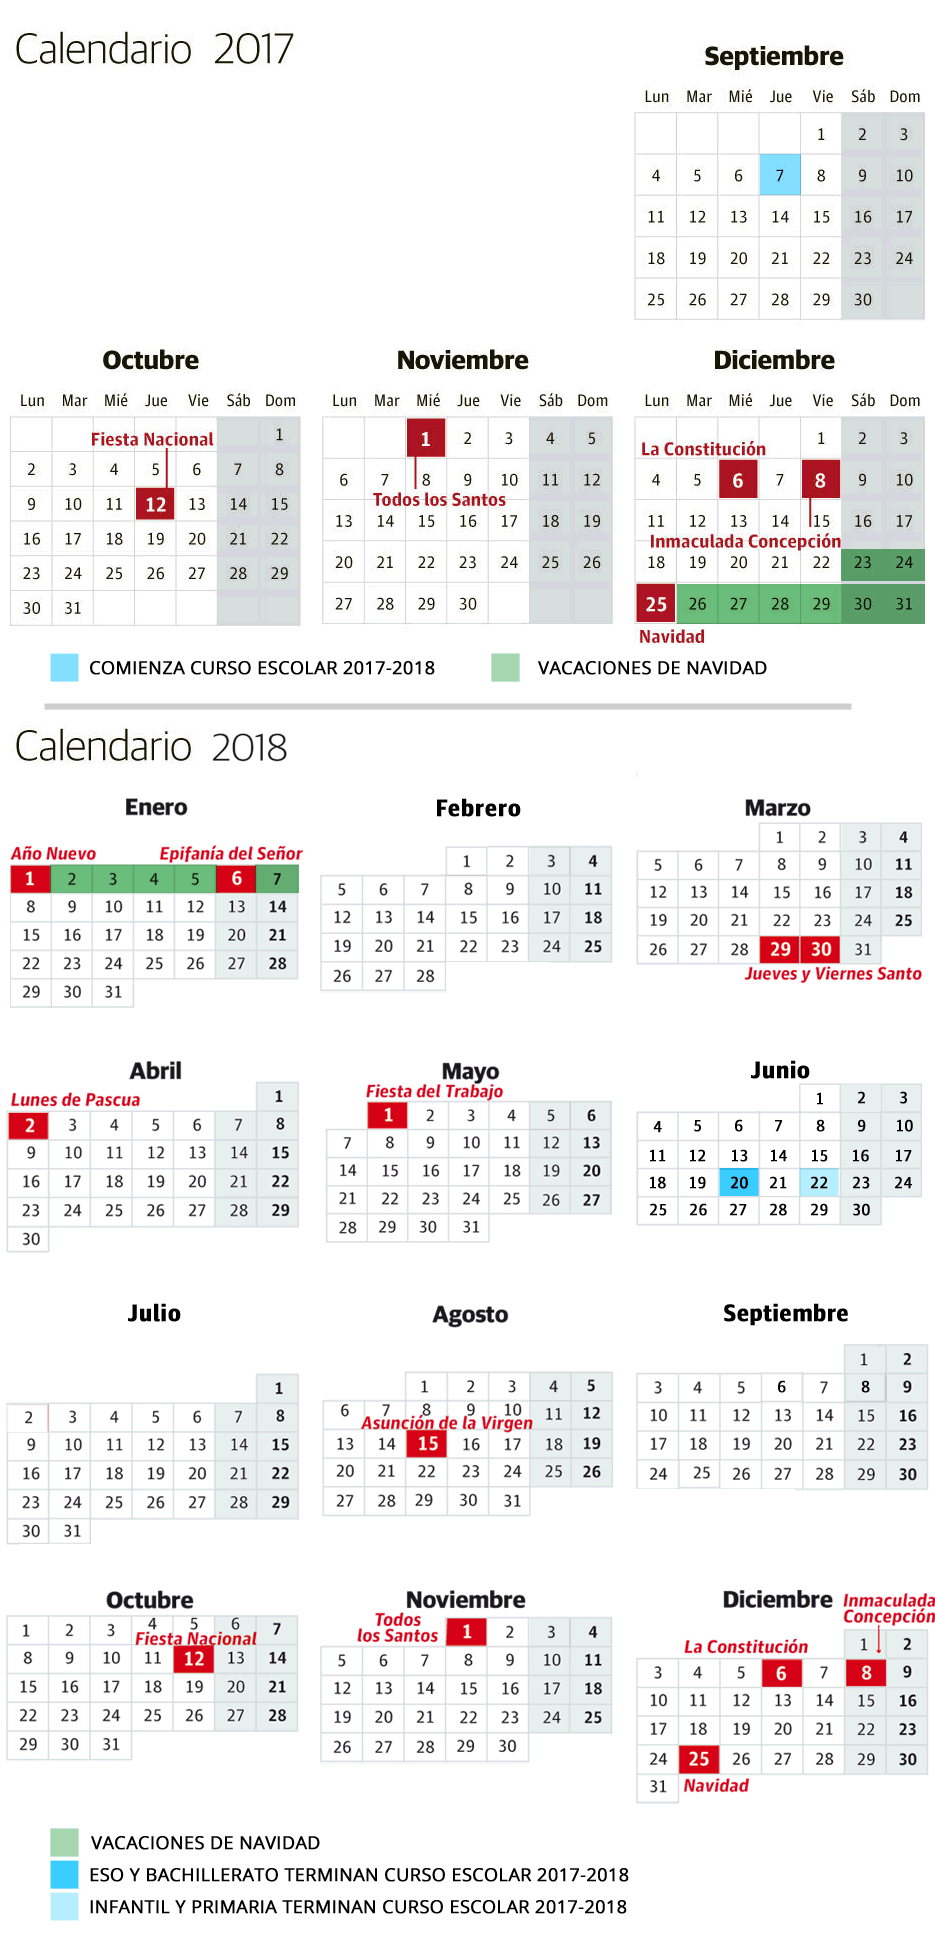 Calendario Escolar Valladolid.Calendario Escolar 2017 2018 En Euskadi El Correo